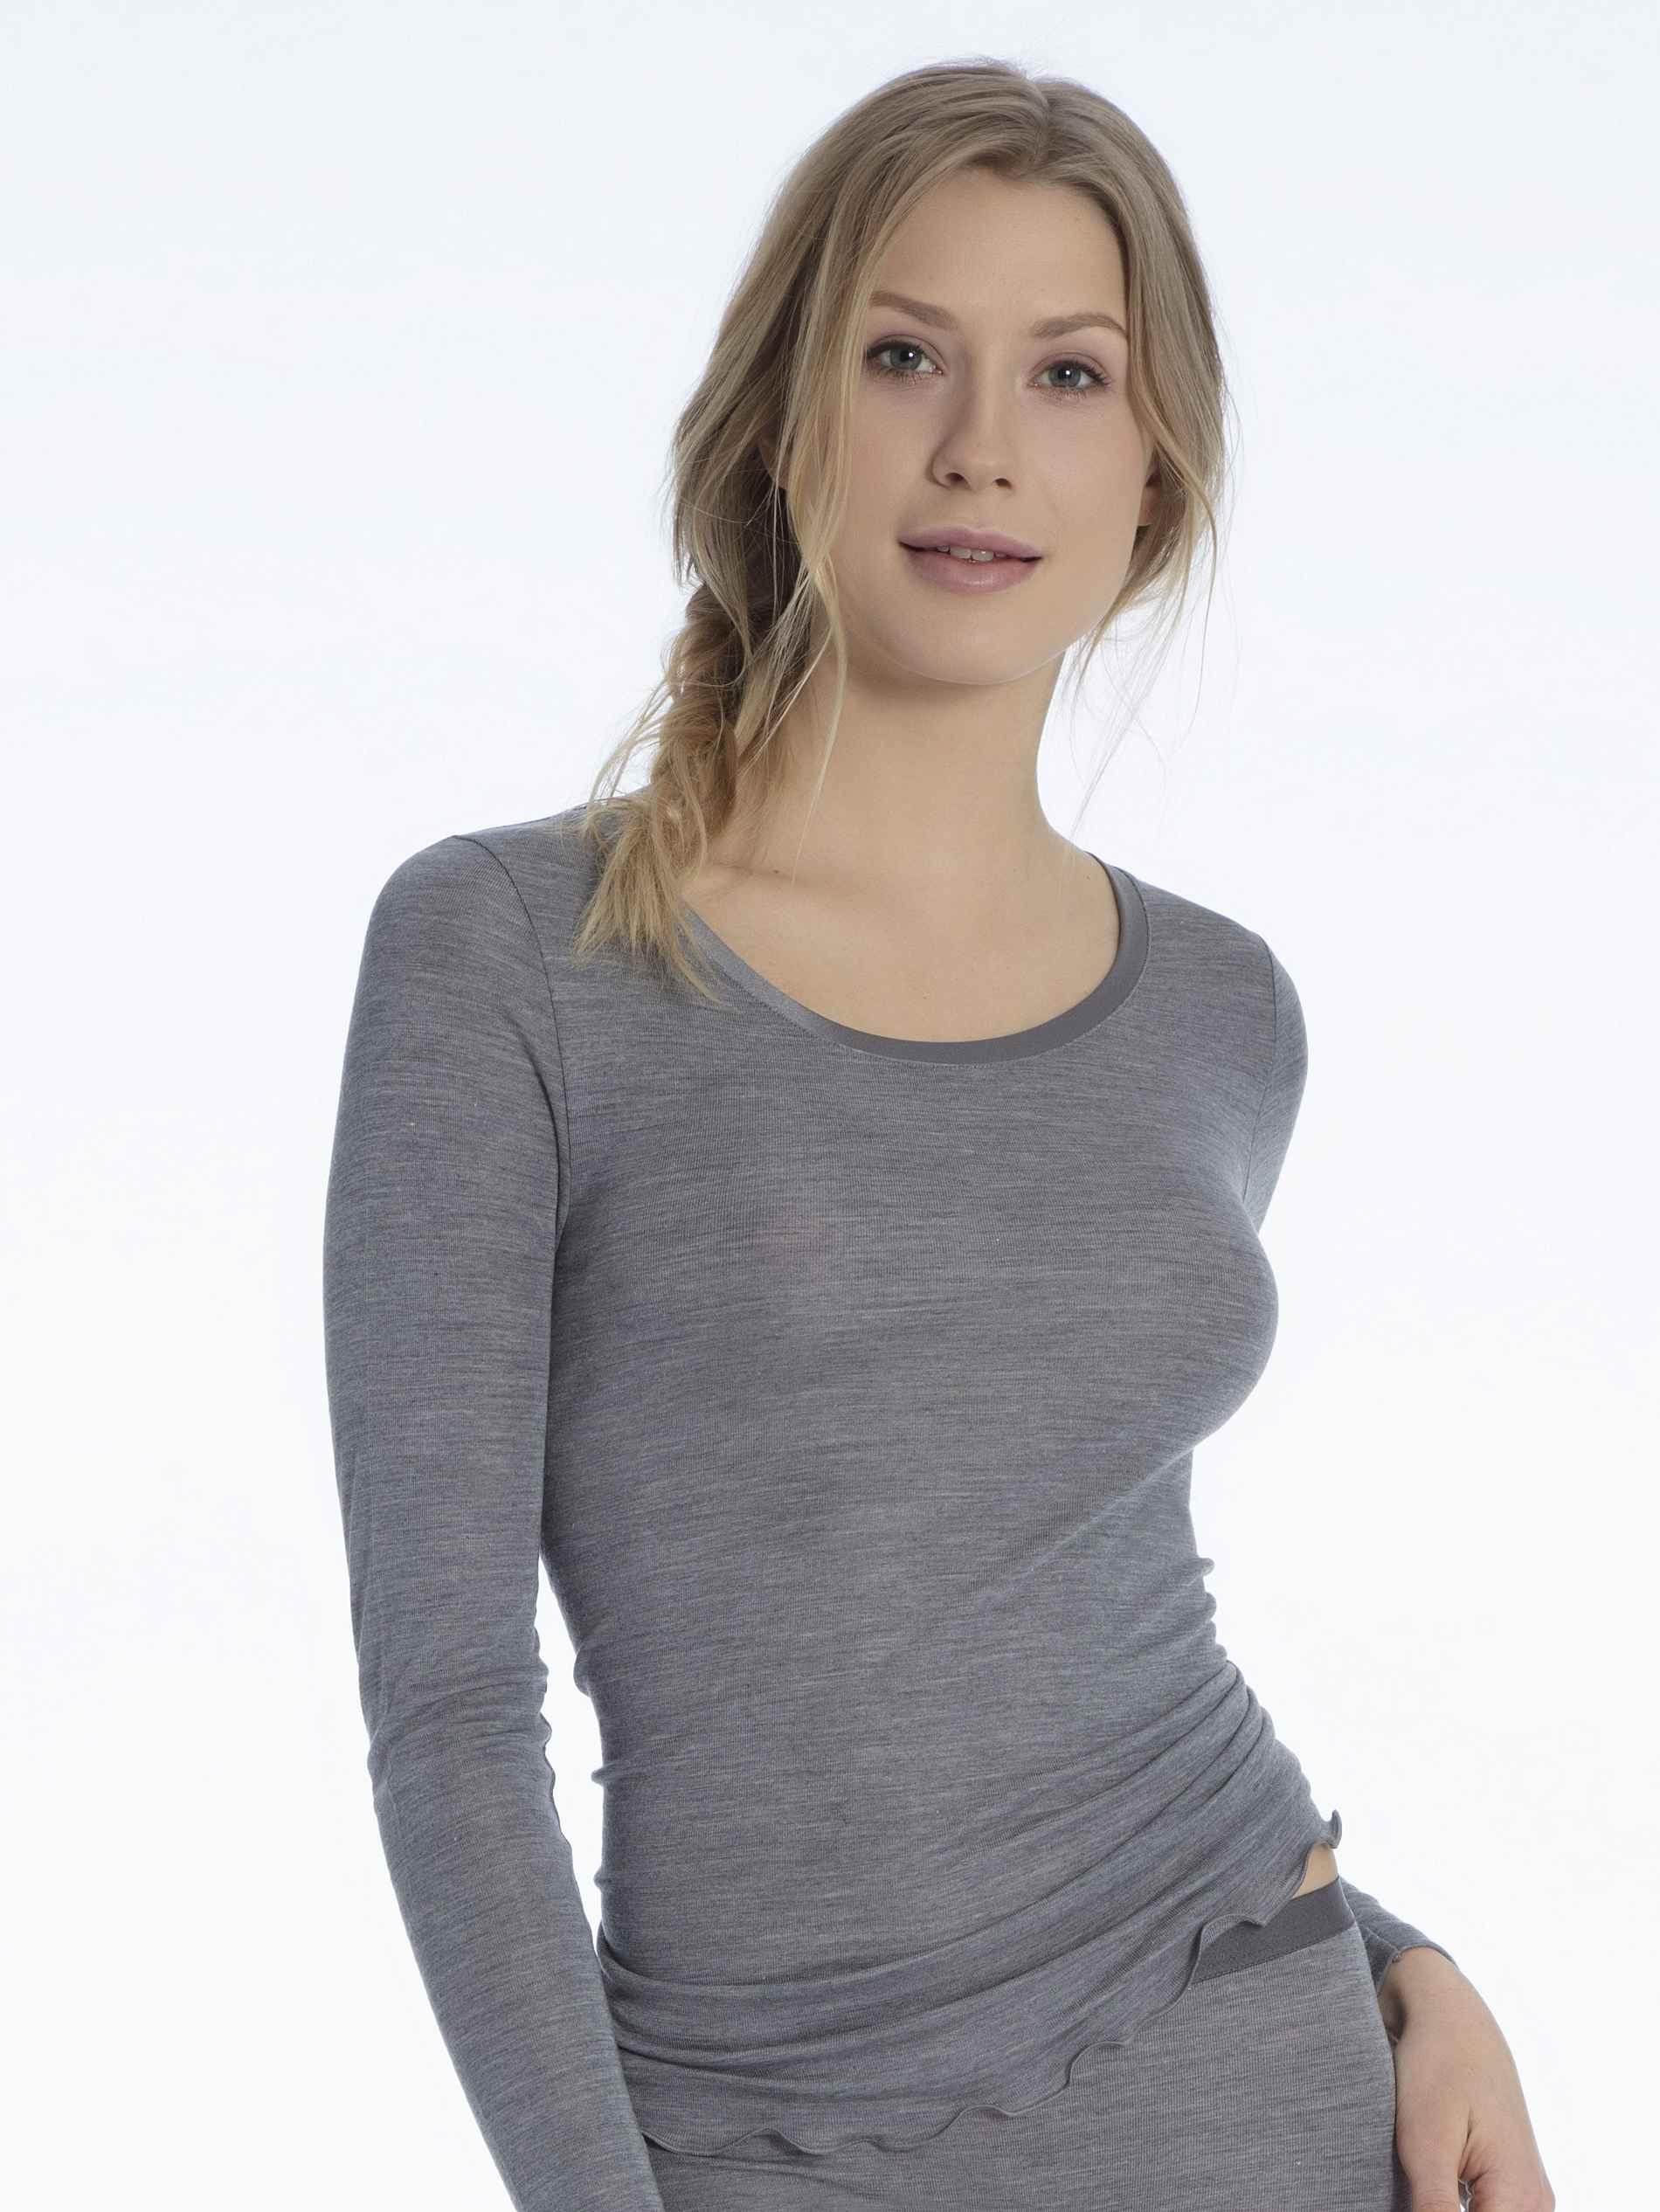 Damen CALIDA True Confidence Langarm-Shirt aus Wolle-Seide grau | 07613306584964